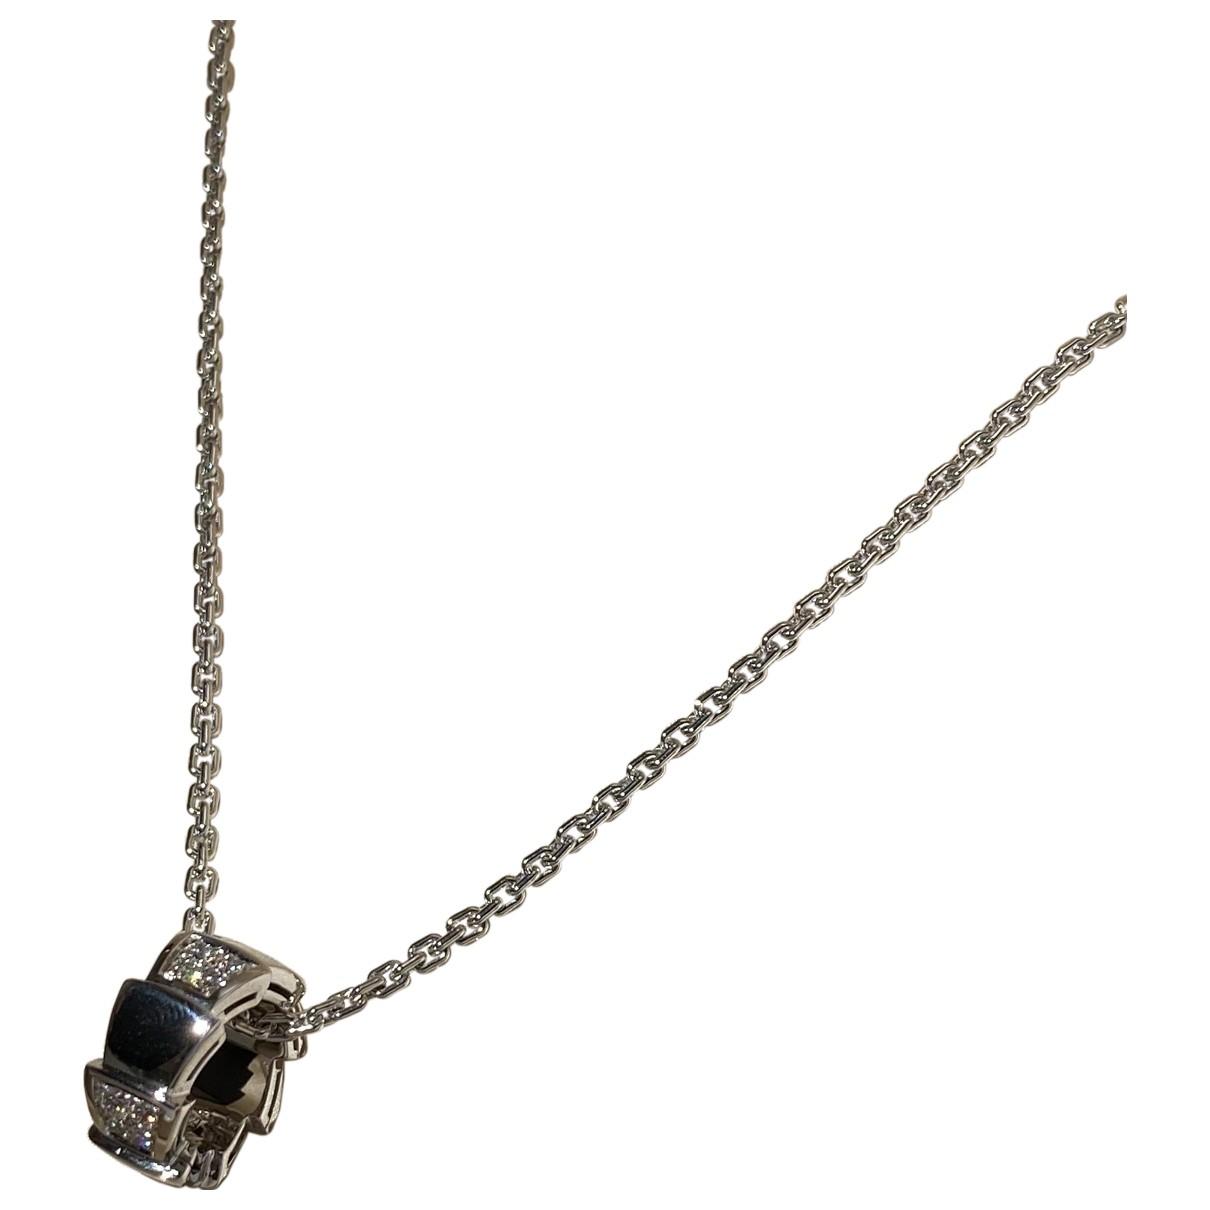 Bvlgari Serpenti White White gold necklace for Women N